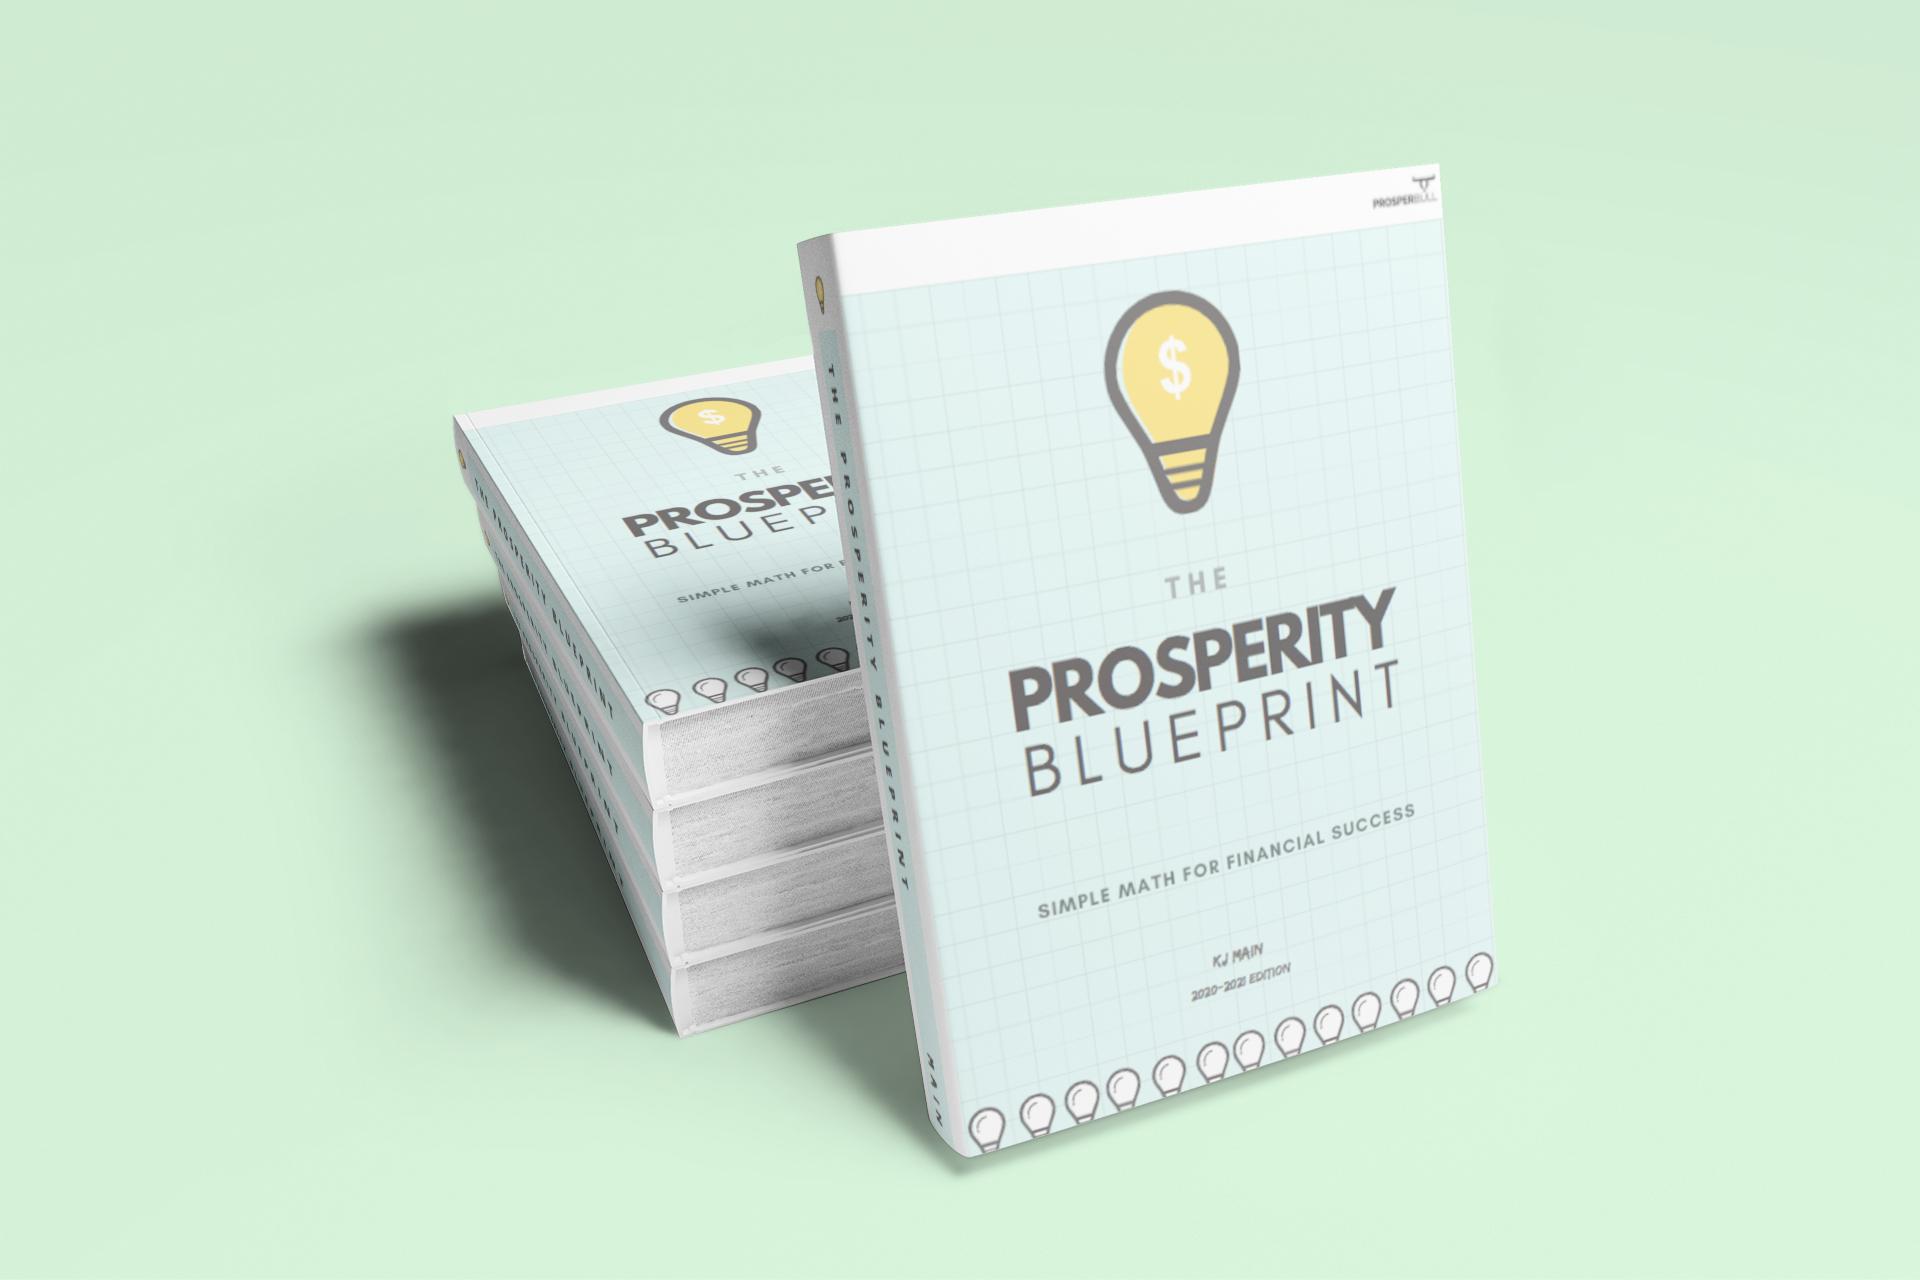 The Prosperity Blueprint Financial Literacy Boo by Kelly Main